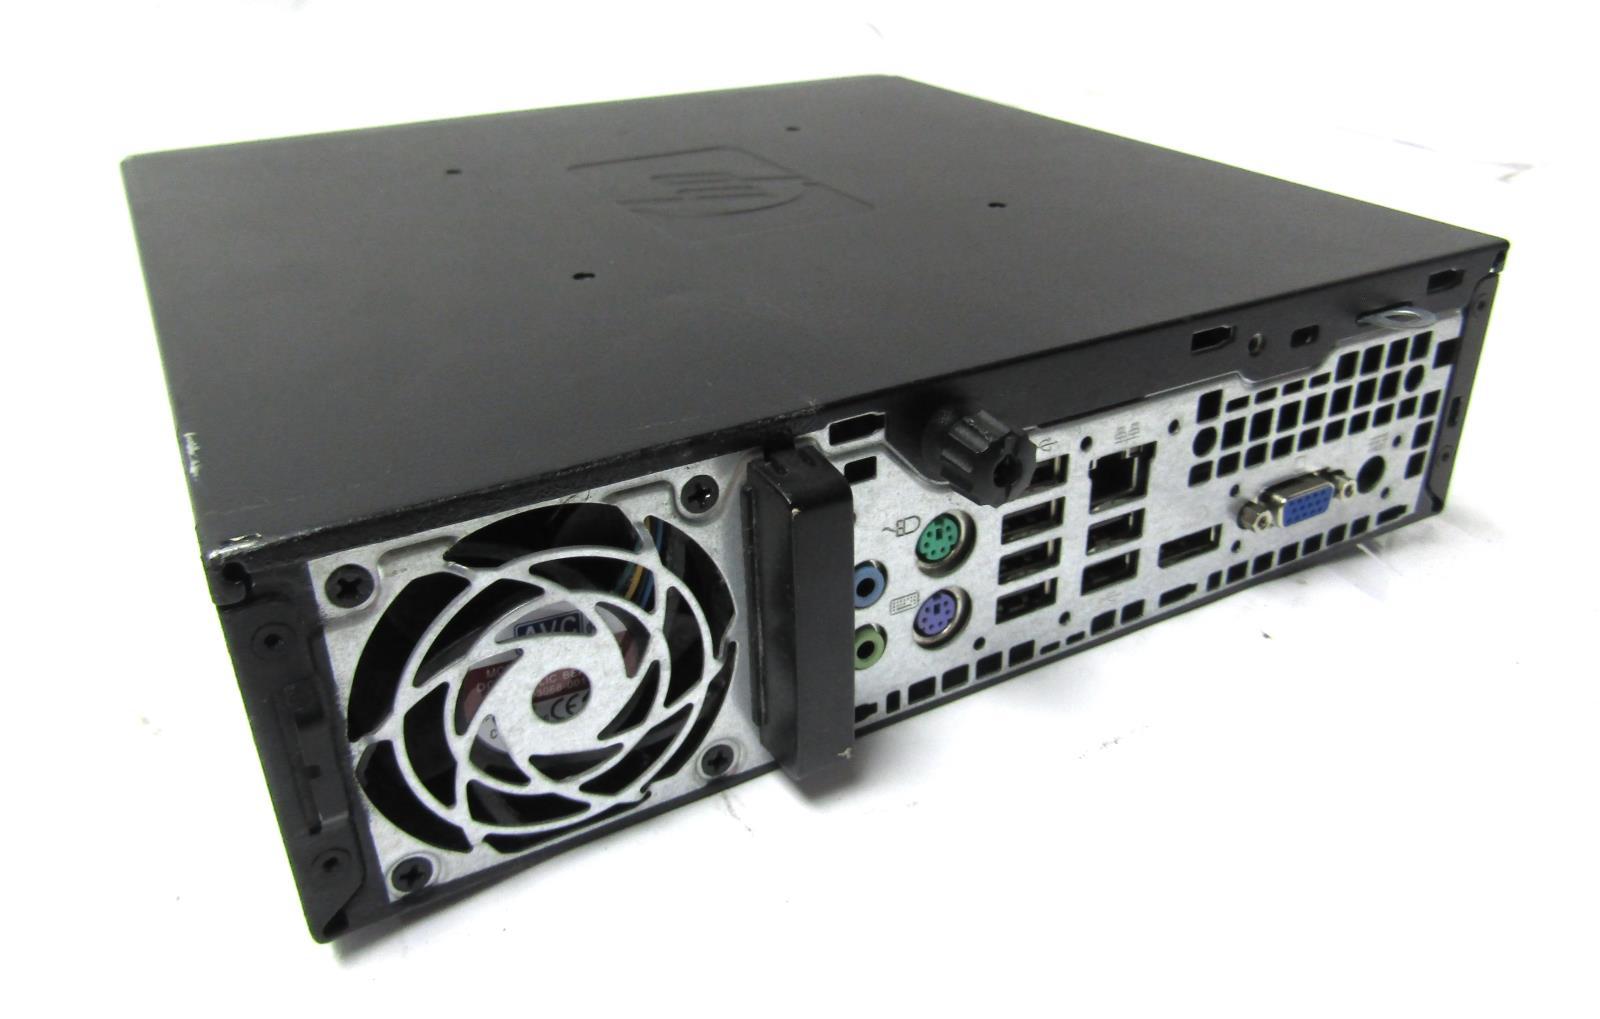 HP Compaq 8000 Elite USFF Desktop | 3 0GHz Core 2 Duo E8400 | 4GB